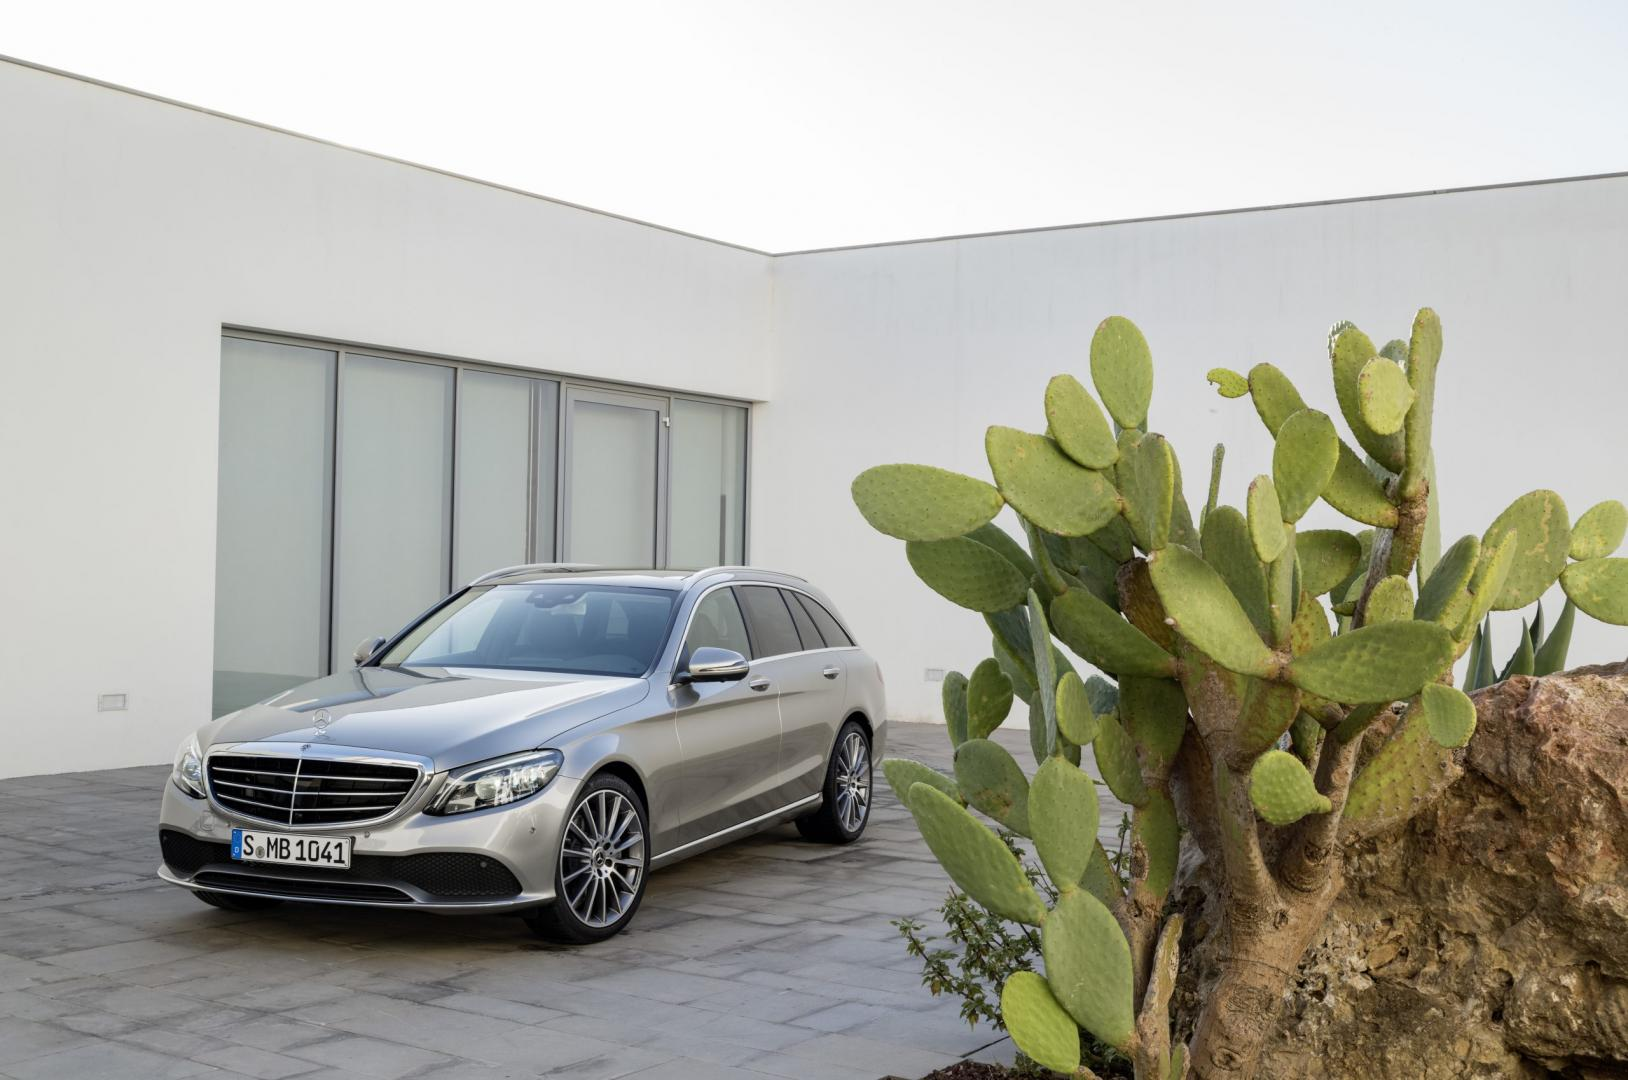 Mercedes C-klasse facelift 2018